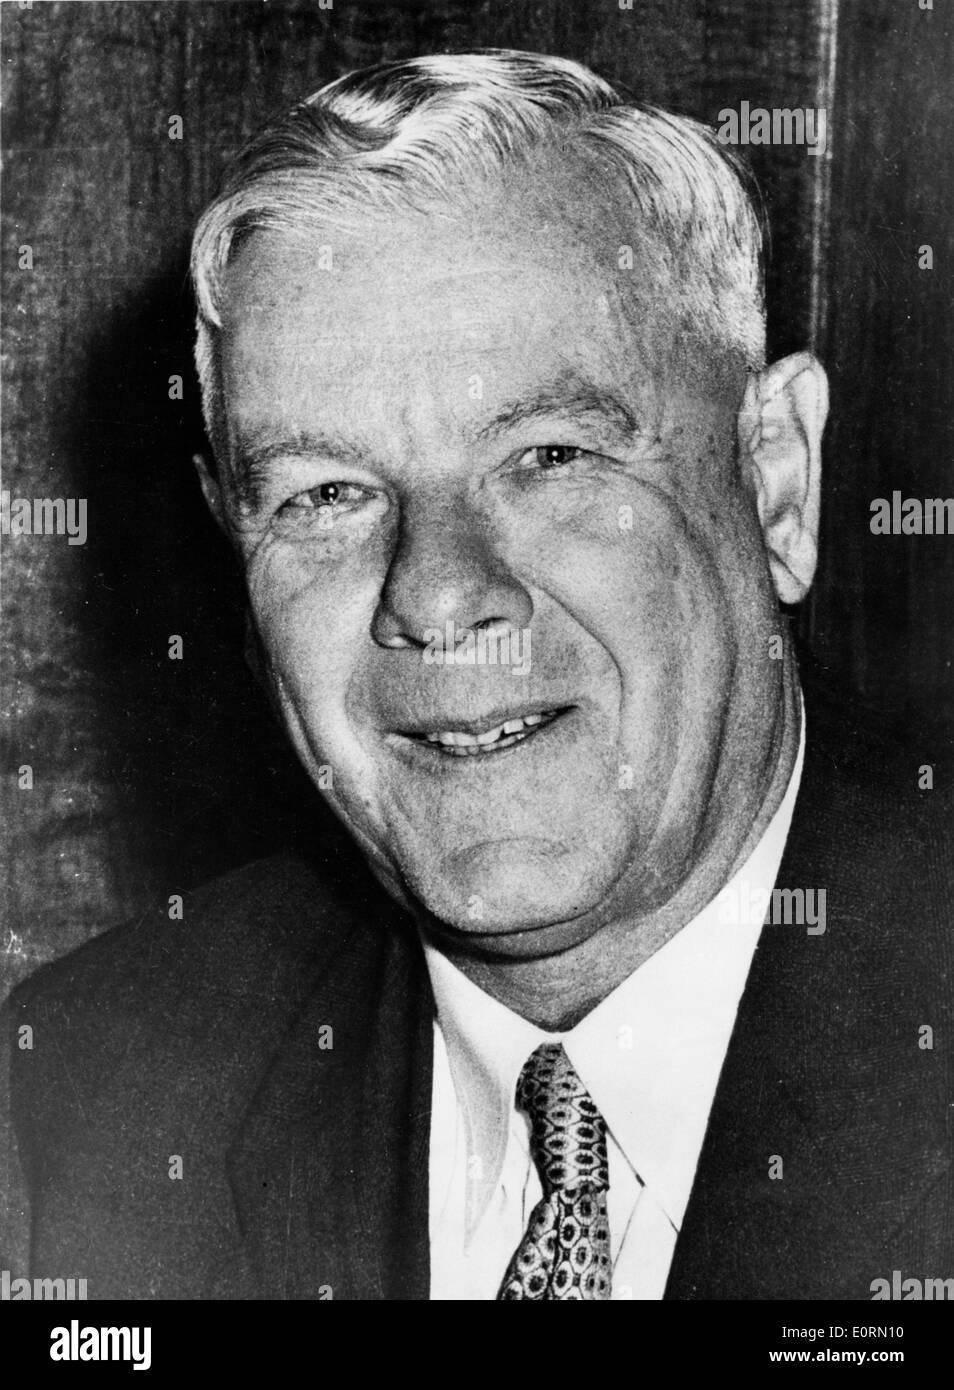 Portrait of the architect of Apartheid Hendrik Verwoerd - Stock Image